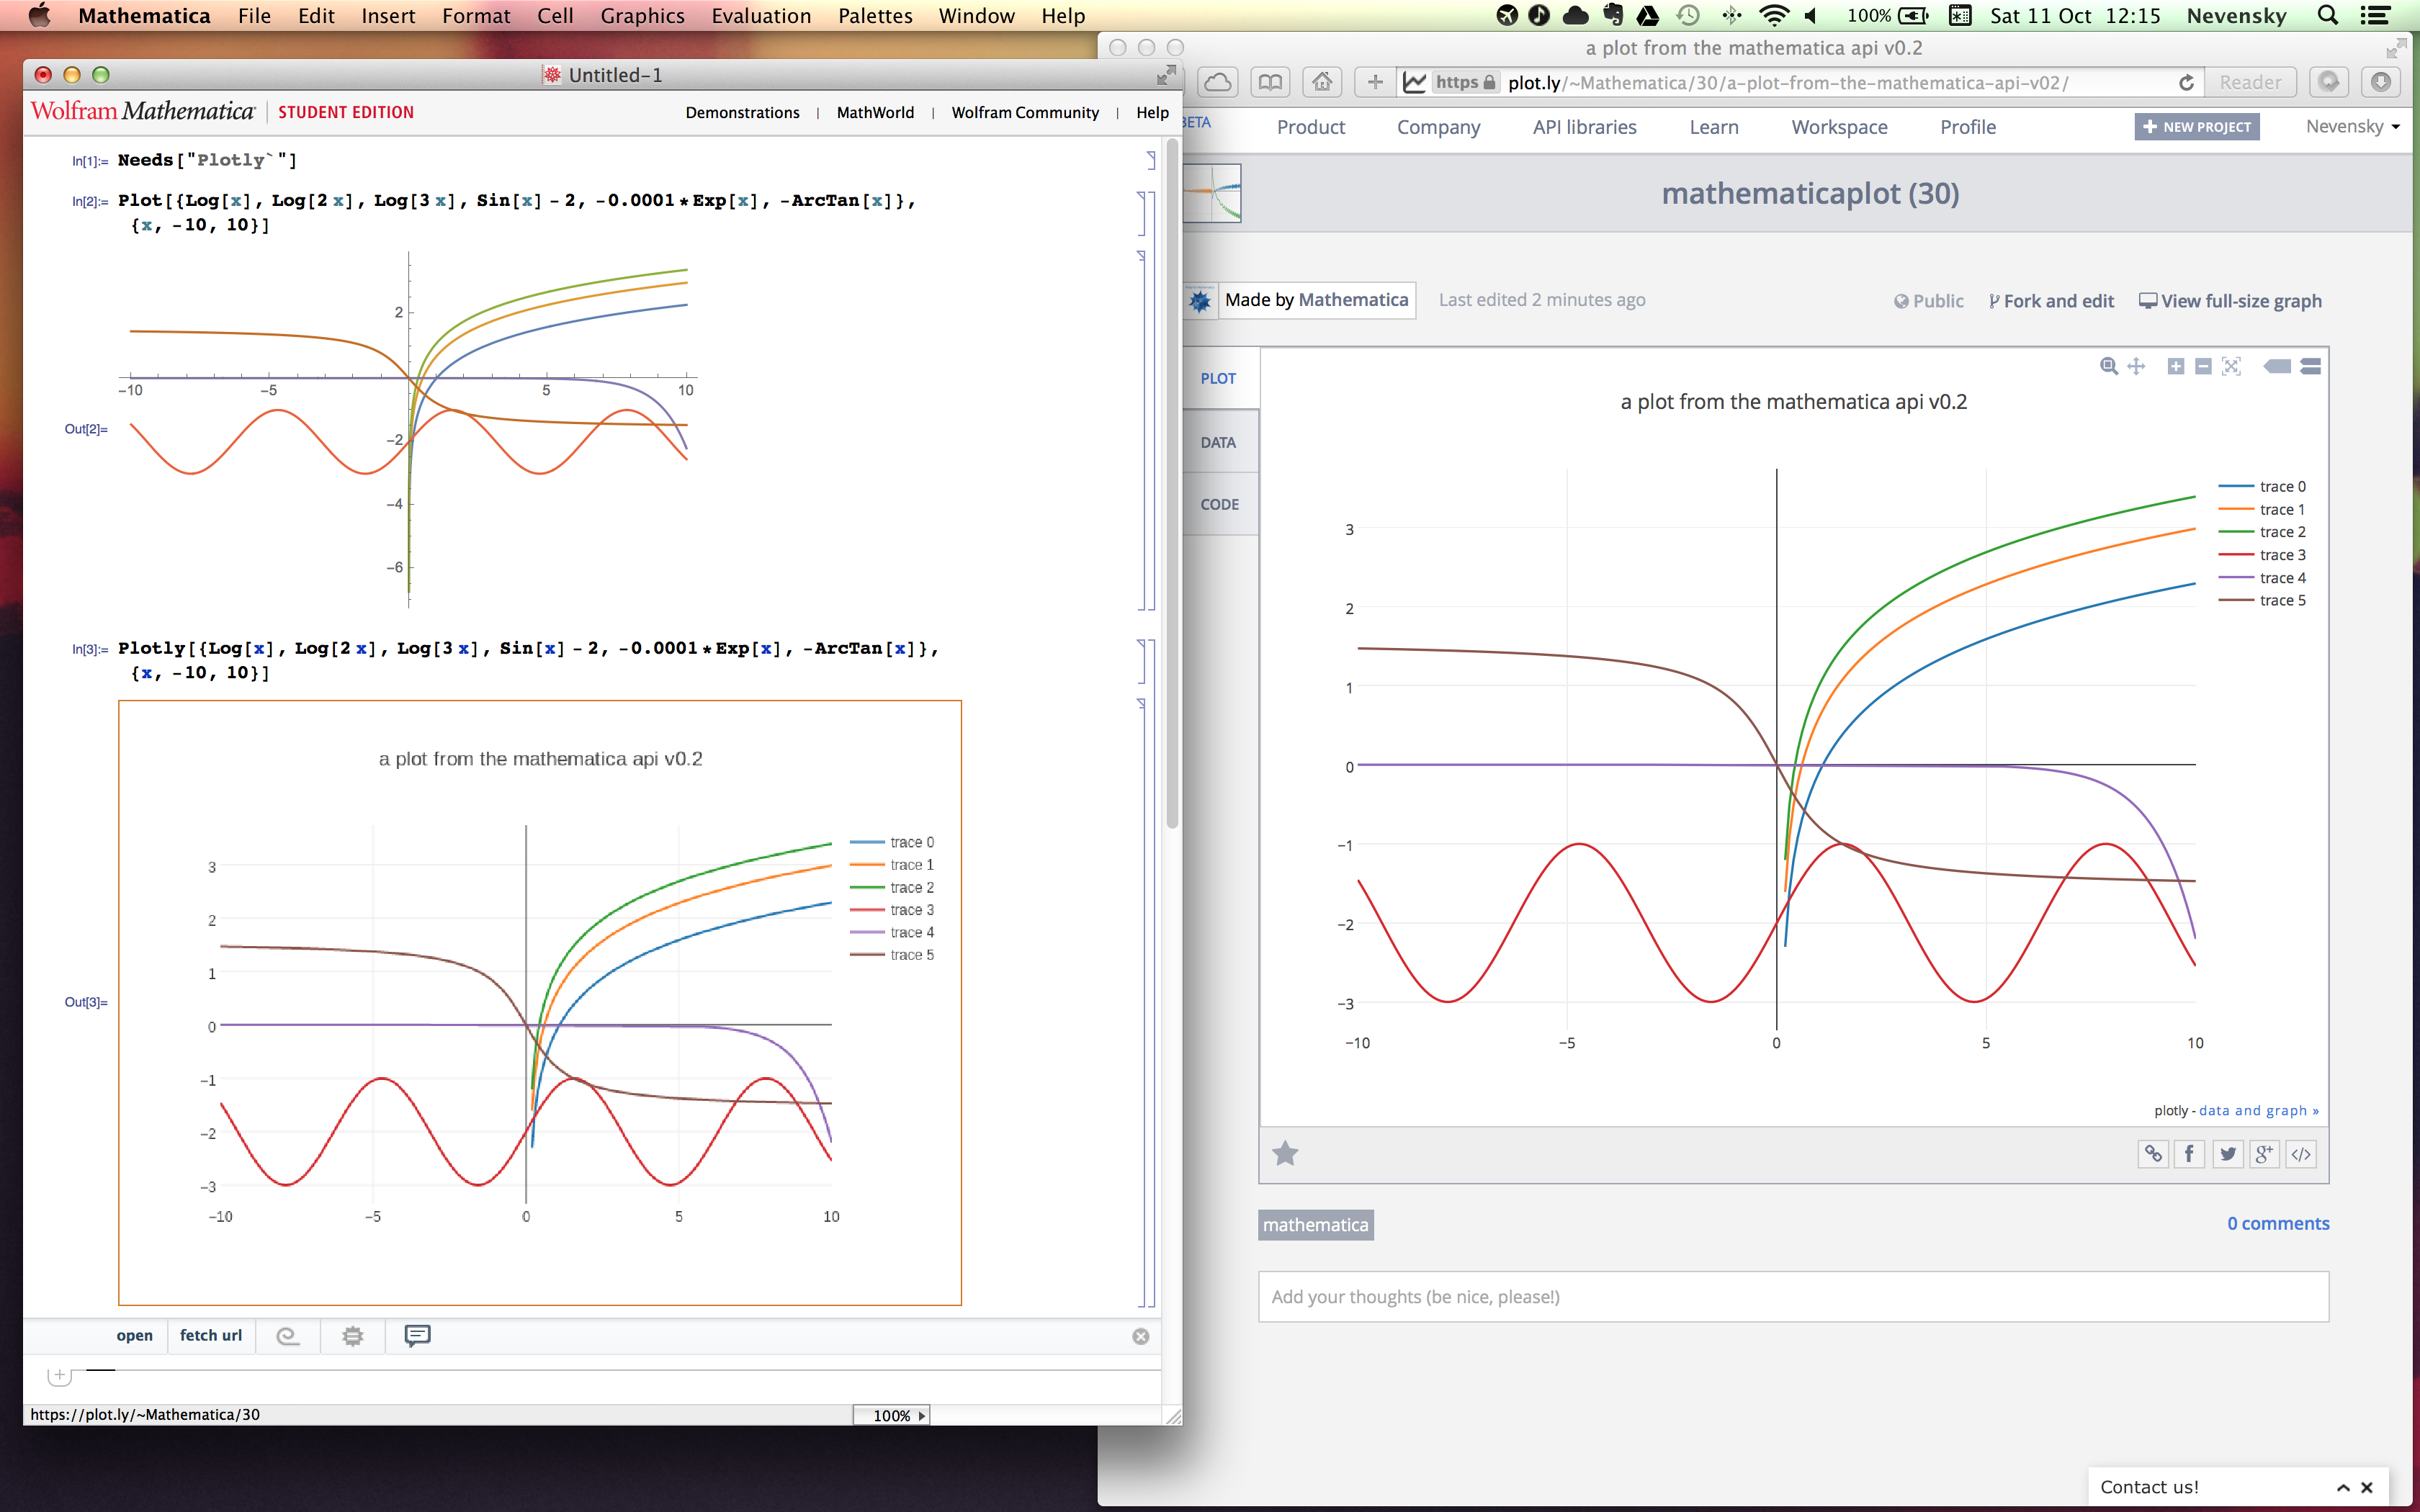 Plotly-Mathematica Plot